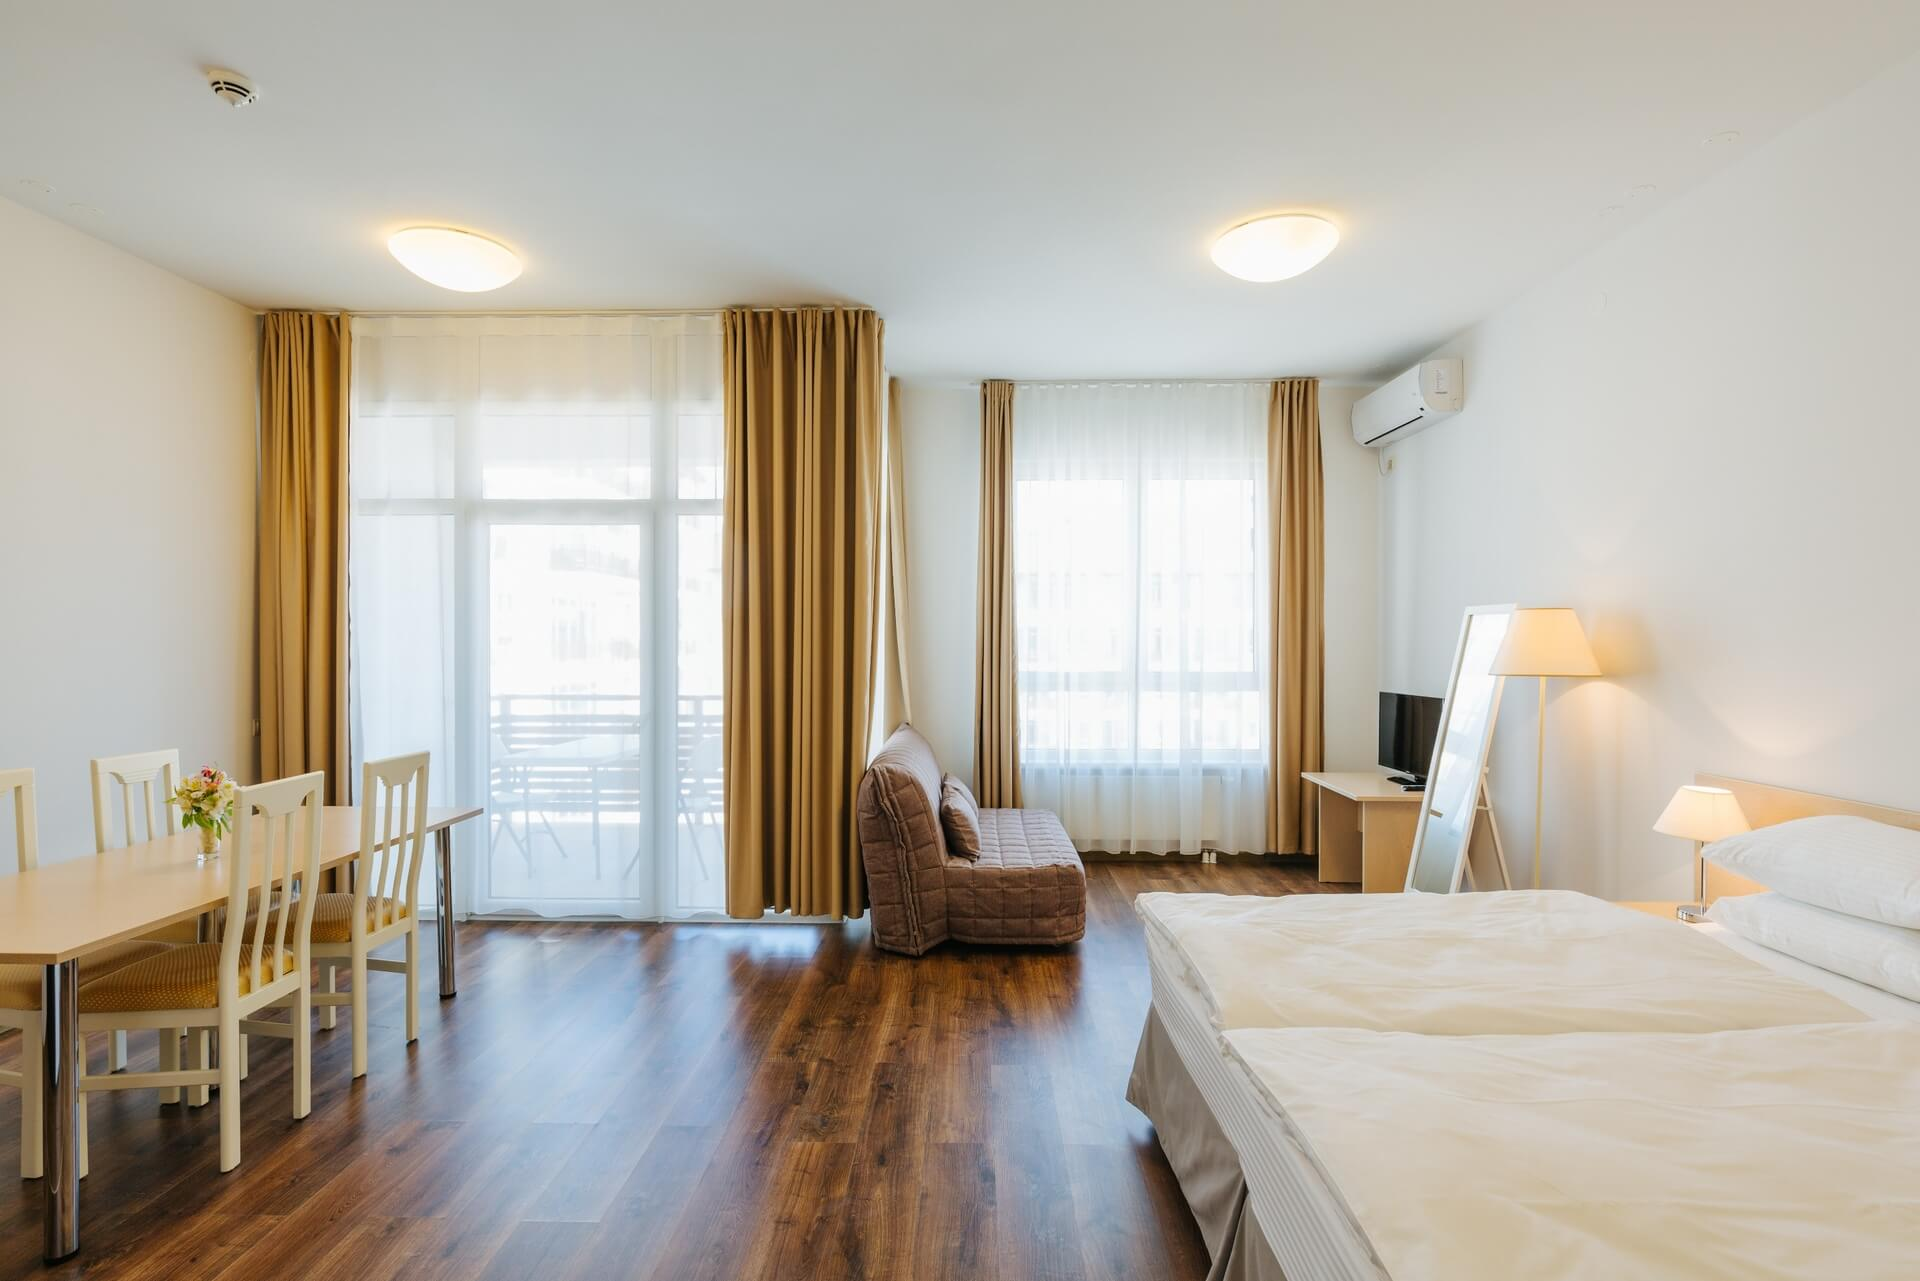 39 апартаментов в популярном комплексе - image 39-apartamentov-v-populyarnom-komplekse-1 on http://bizneskvartal.ru